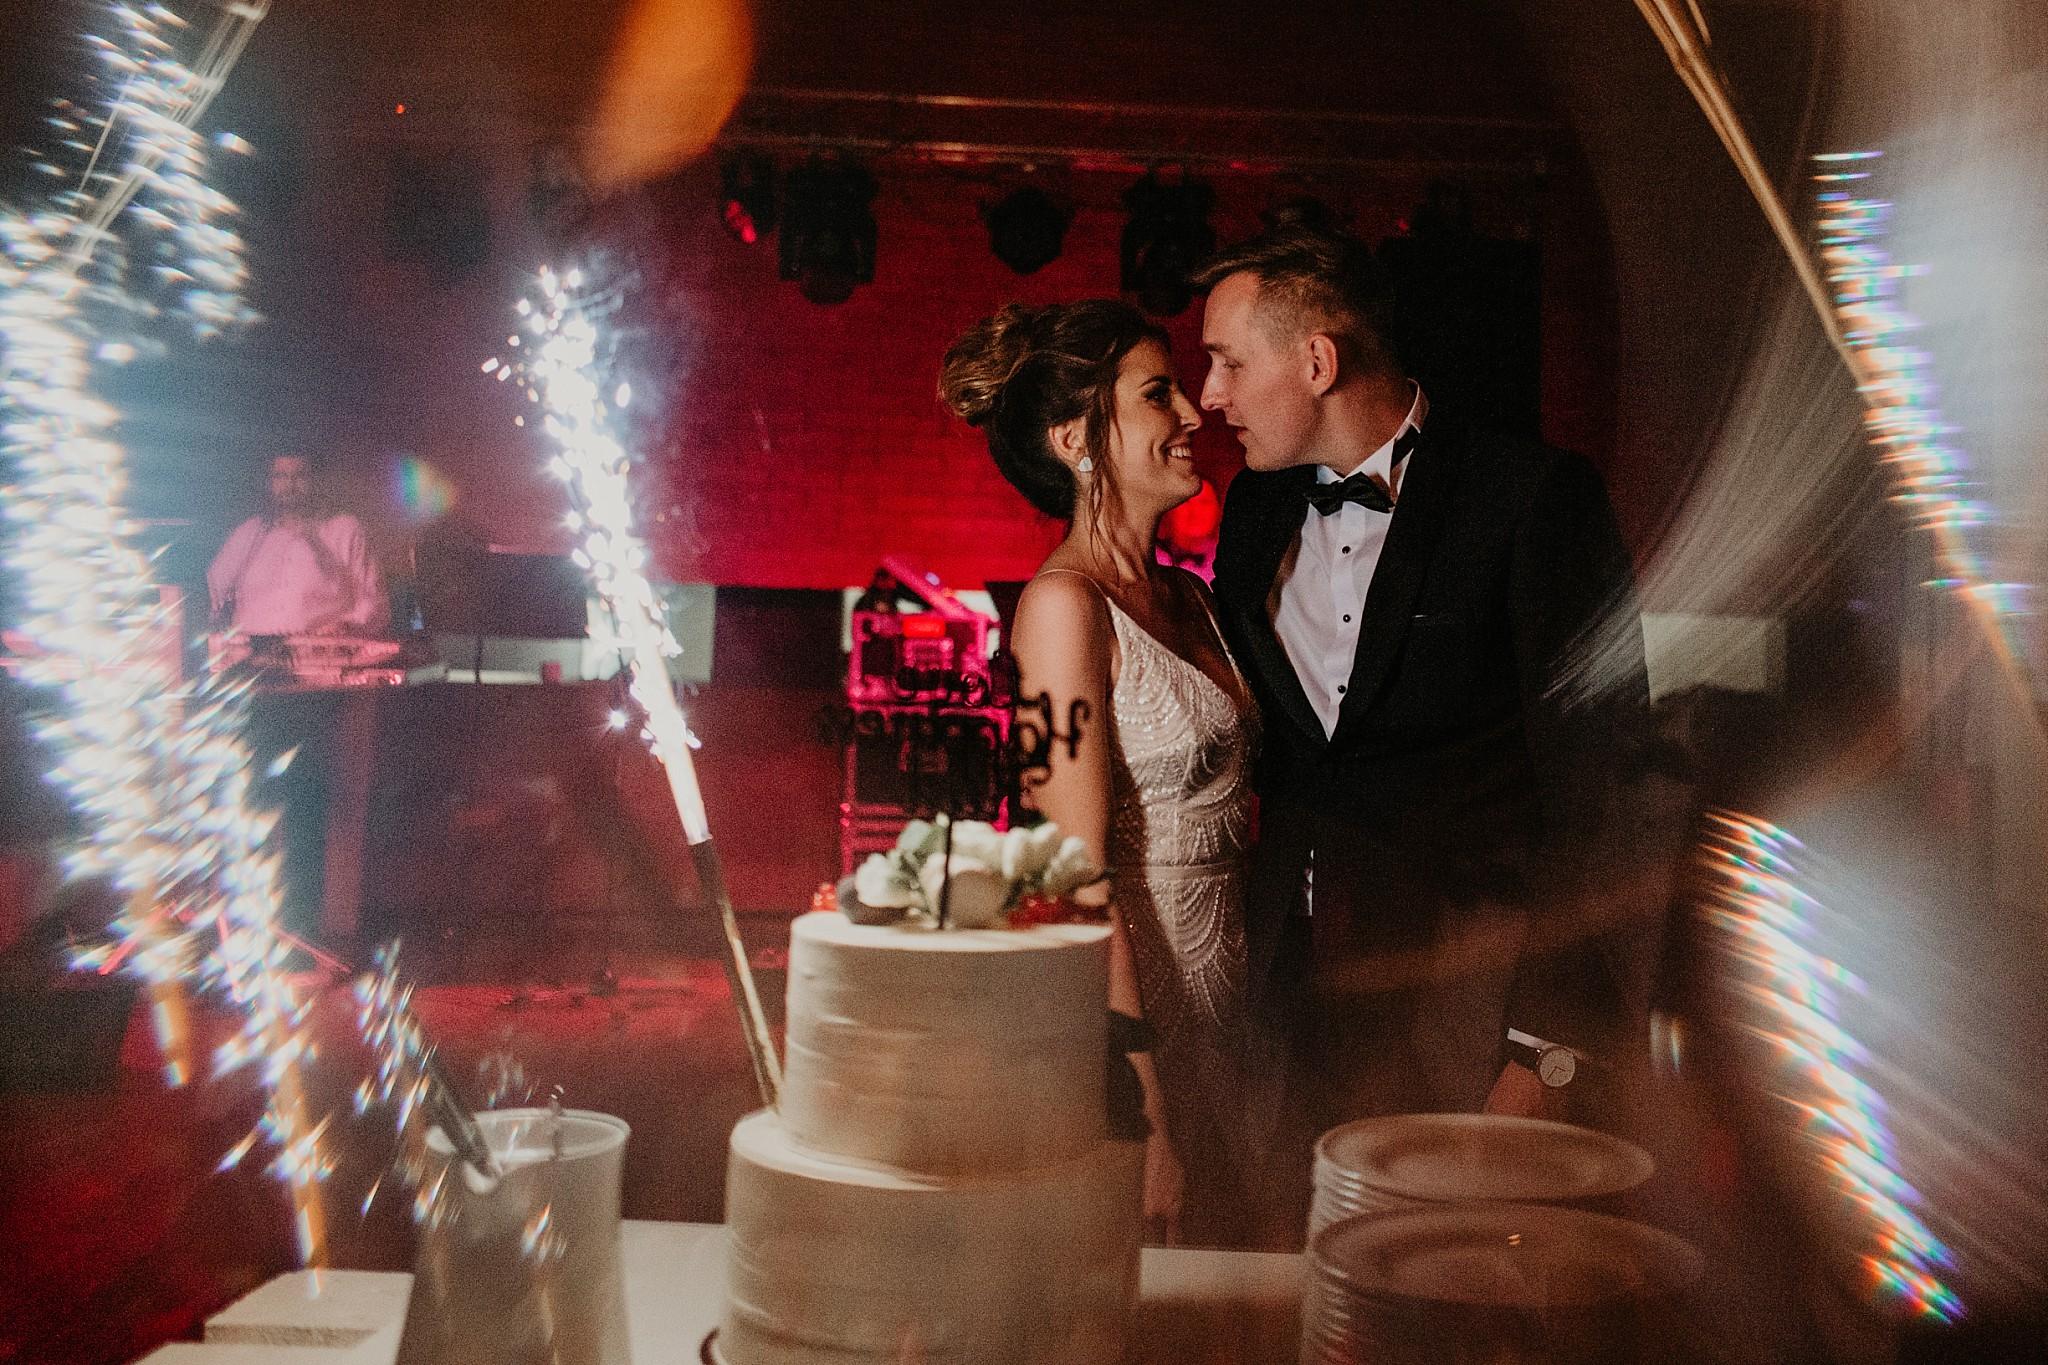 fotograf poznan wesele dobra truskawka piekne wesele pod poznaniem wesele w dobrej truskawce piekna para mloda slub marzen slub koronawirus slub listopad wesele koronawirus 496